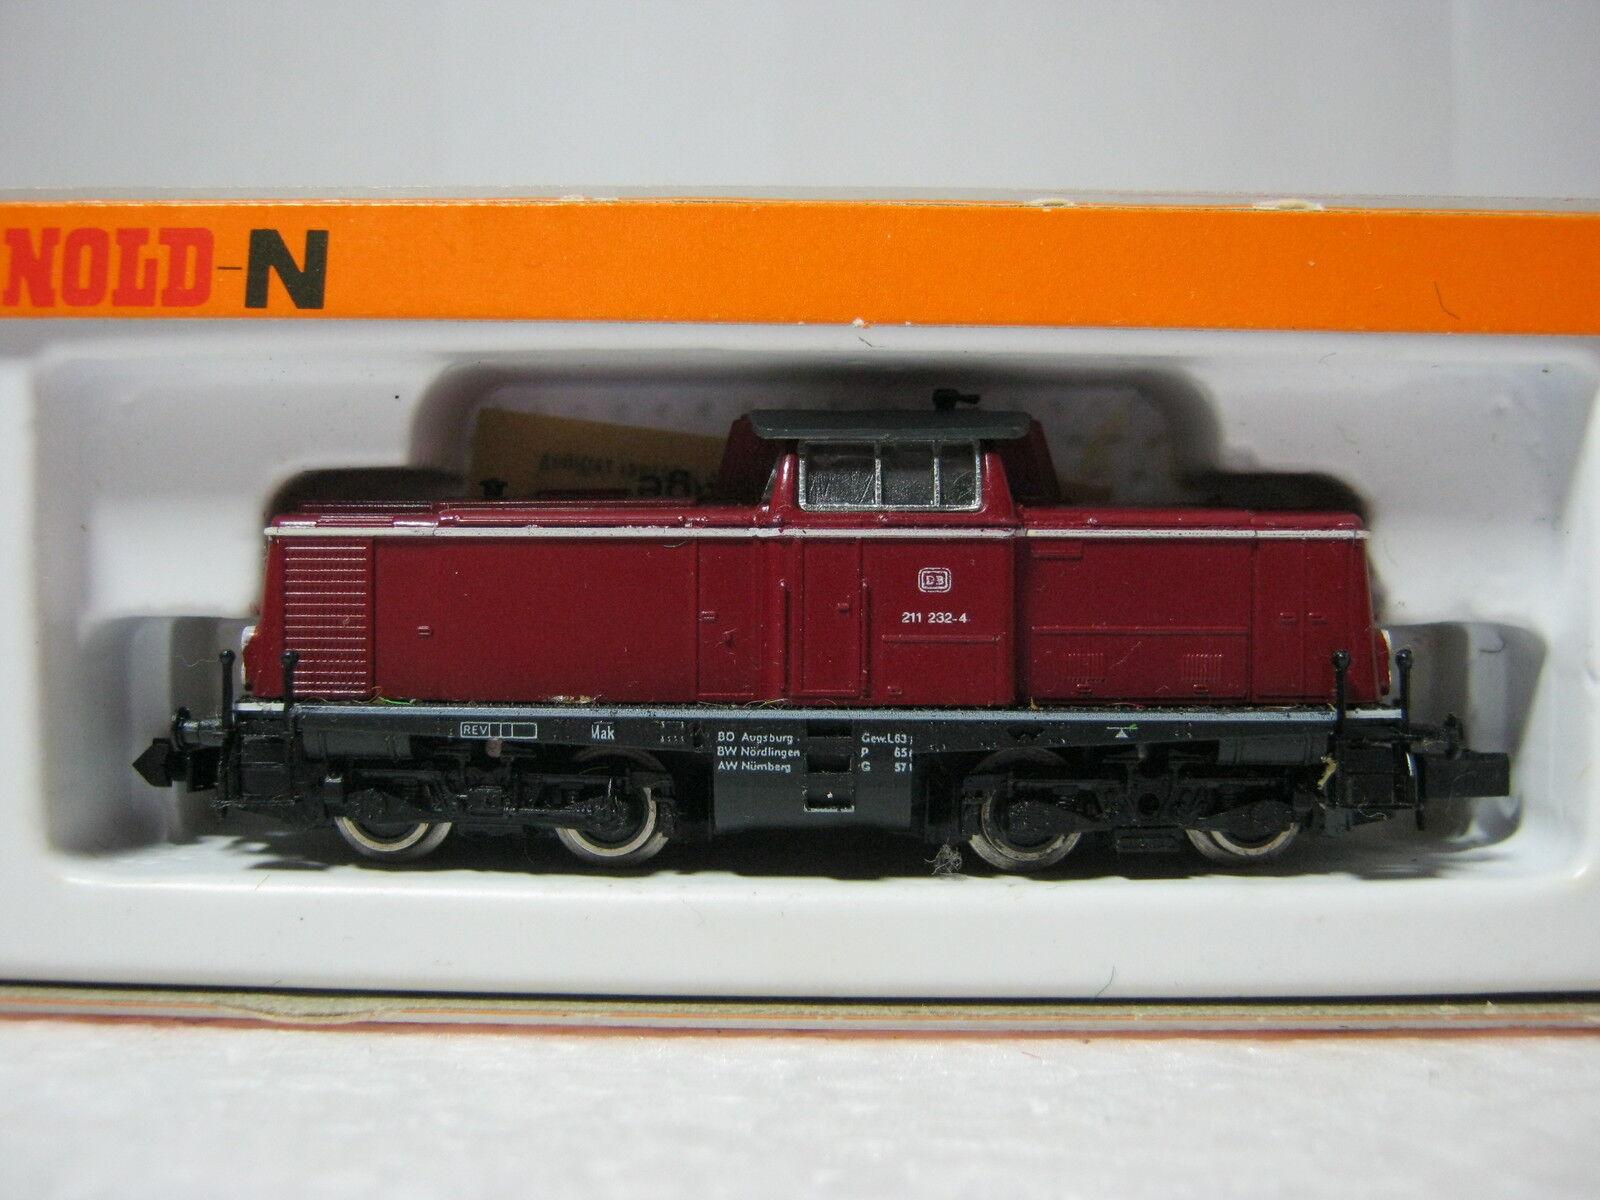 Arnold N 2010 treno BTR. n. 211 232-4 232-4 232-4 DB altrot  rg/aa/55s5  8b6fde